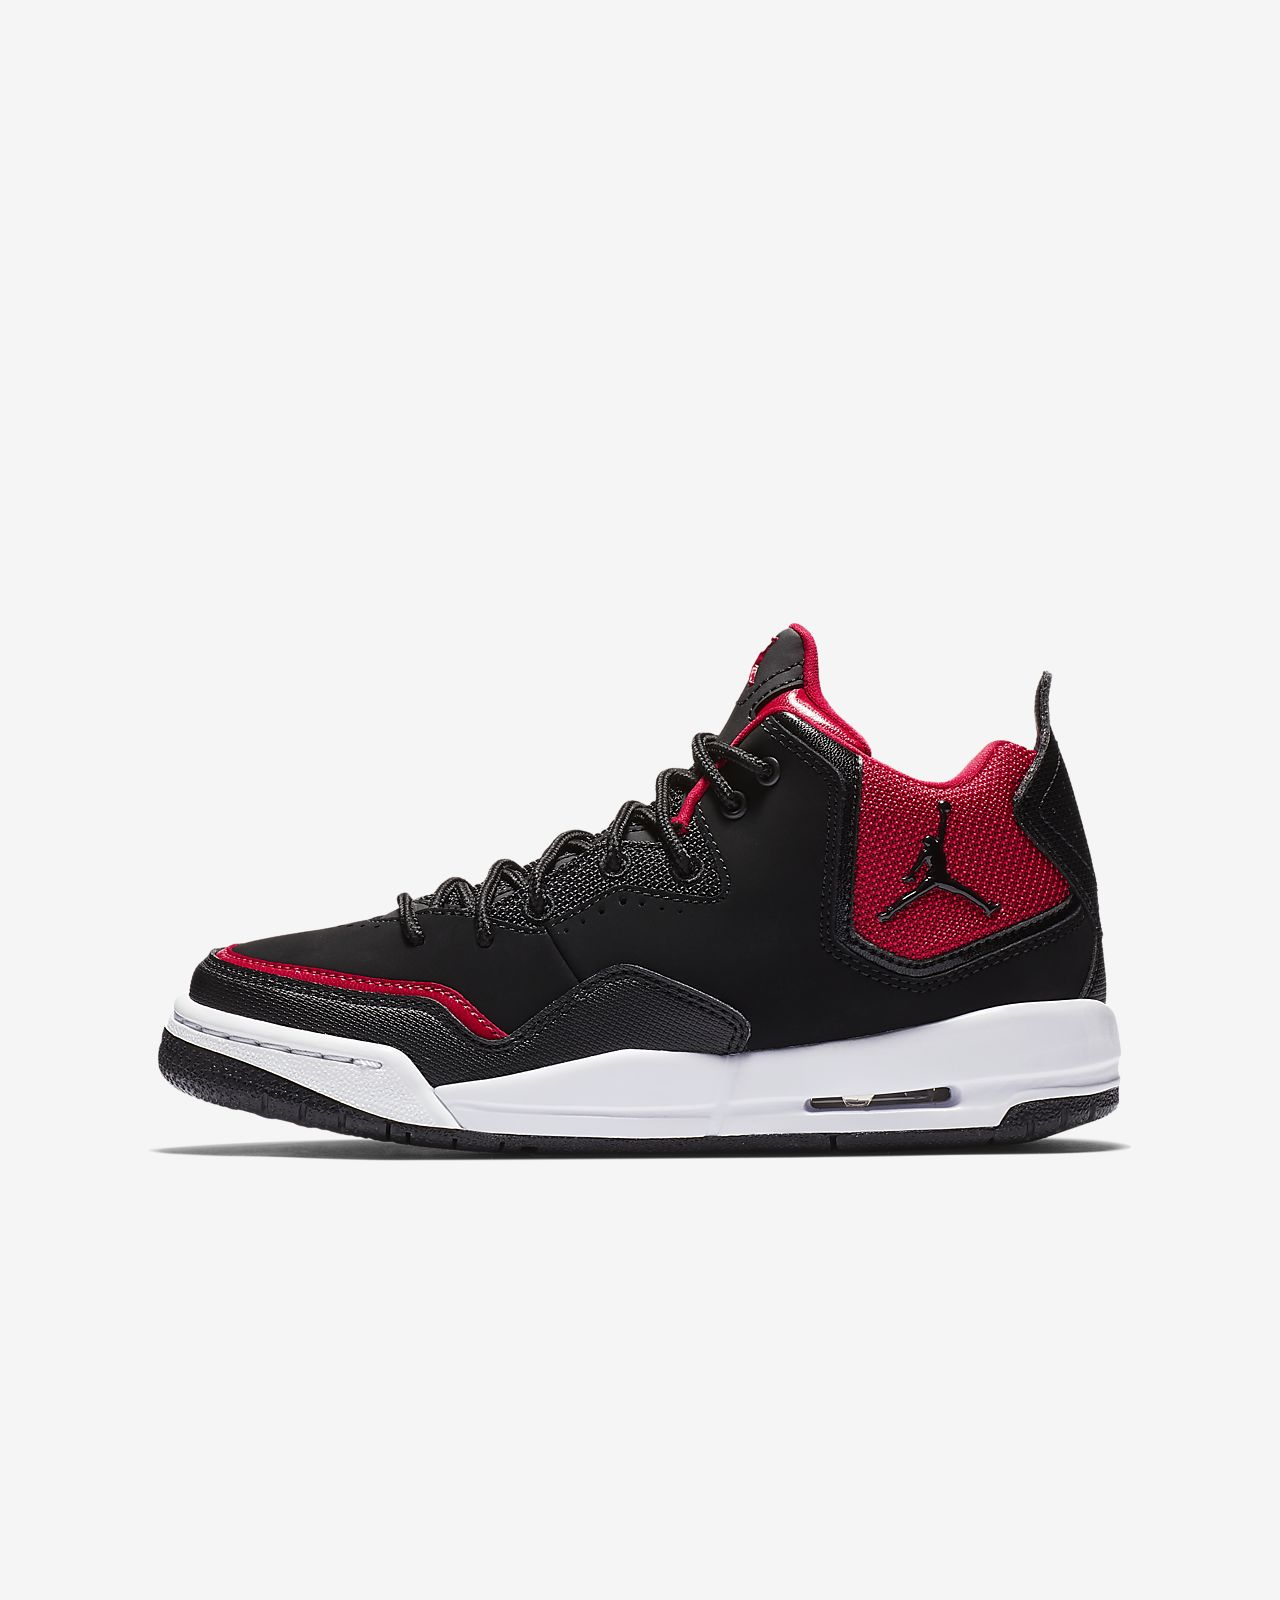 best service 232ce 4be2c ... Jordan Courtside 23 Schuh für ältere Kinder